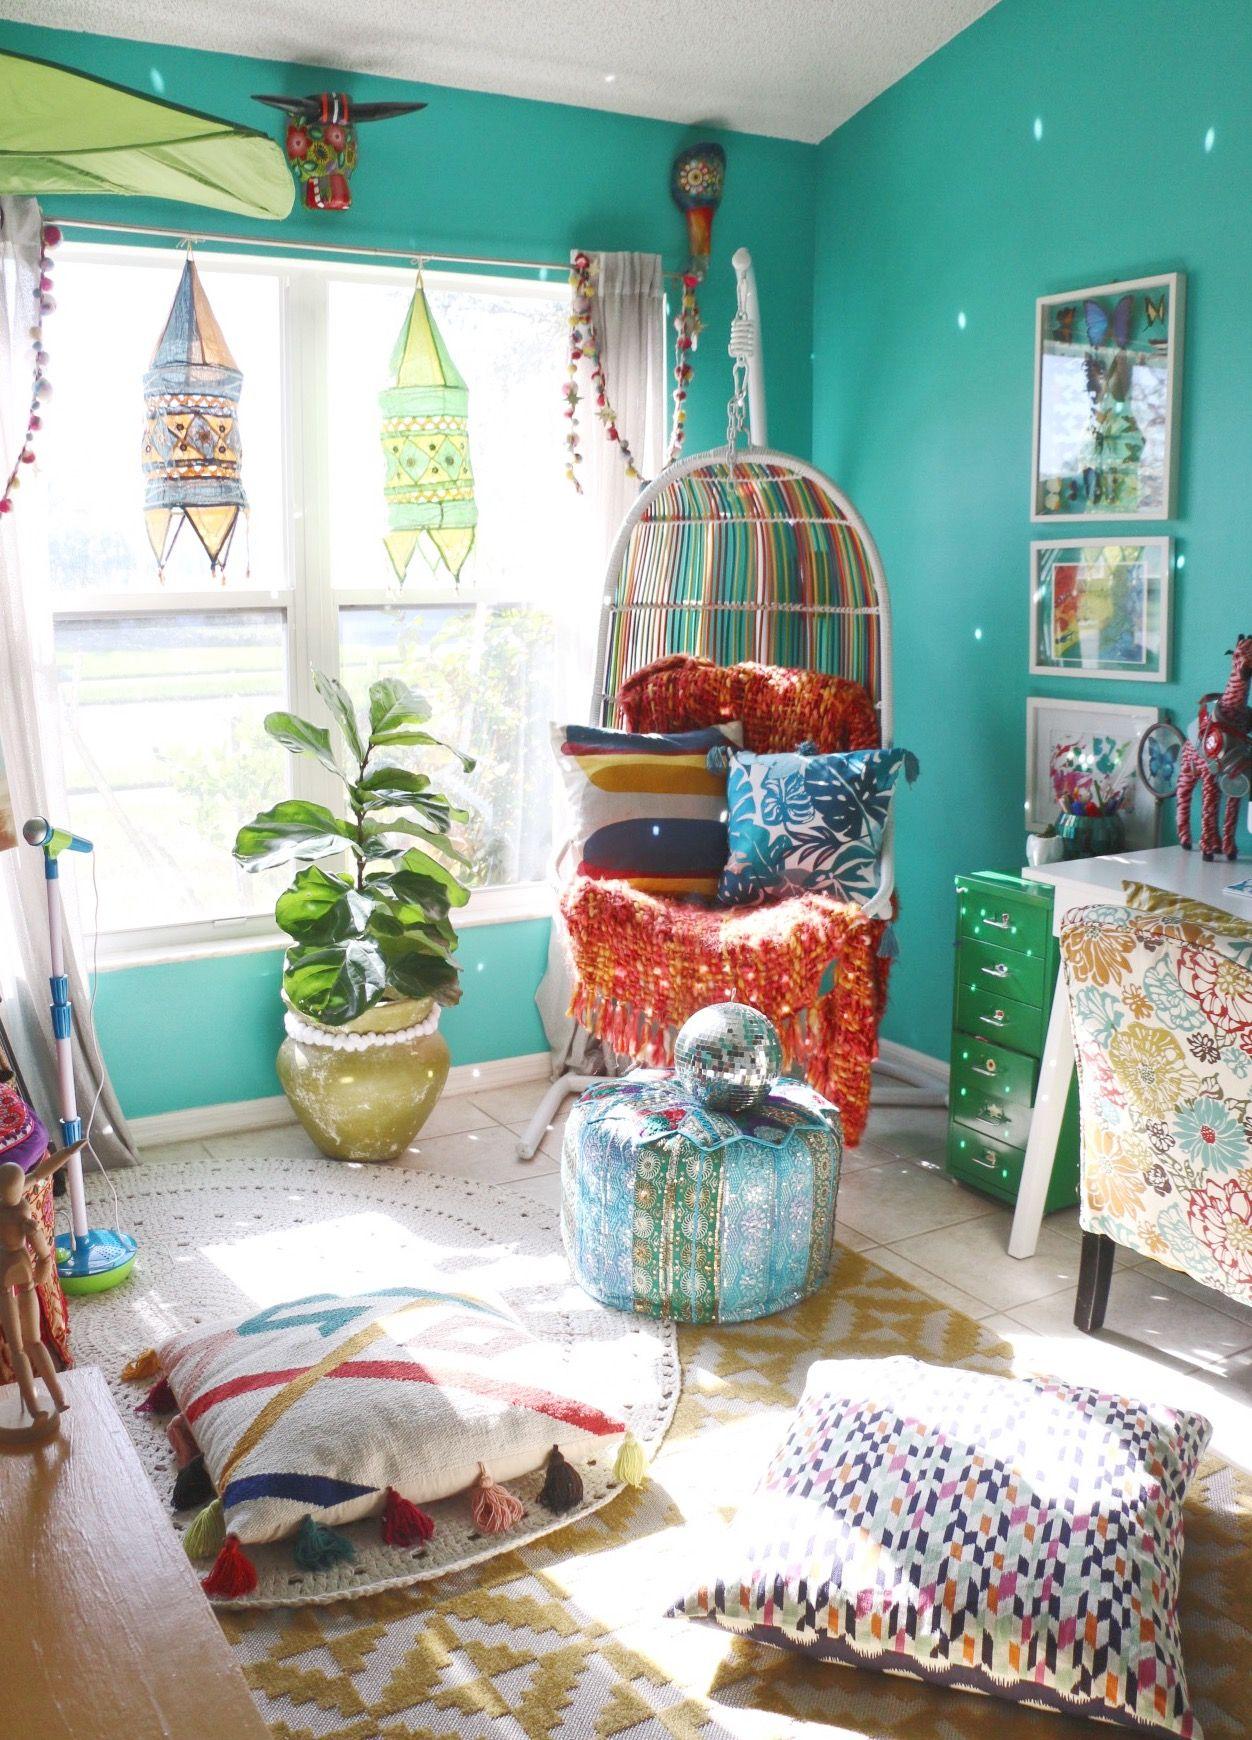 This Home May Be The Tropical Boho Bungalow Of Your Dreams Boho Bungalow Room Decor Retro Home Decor